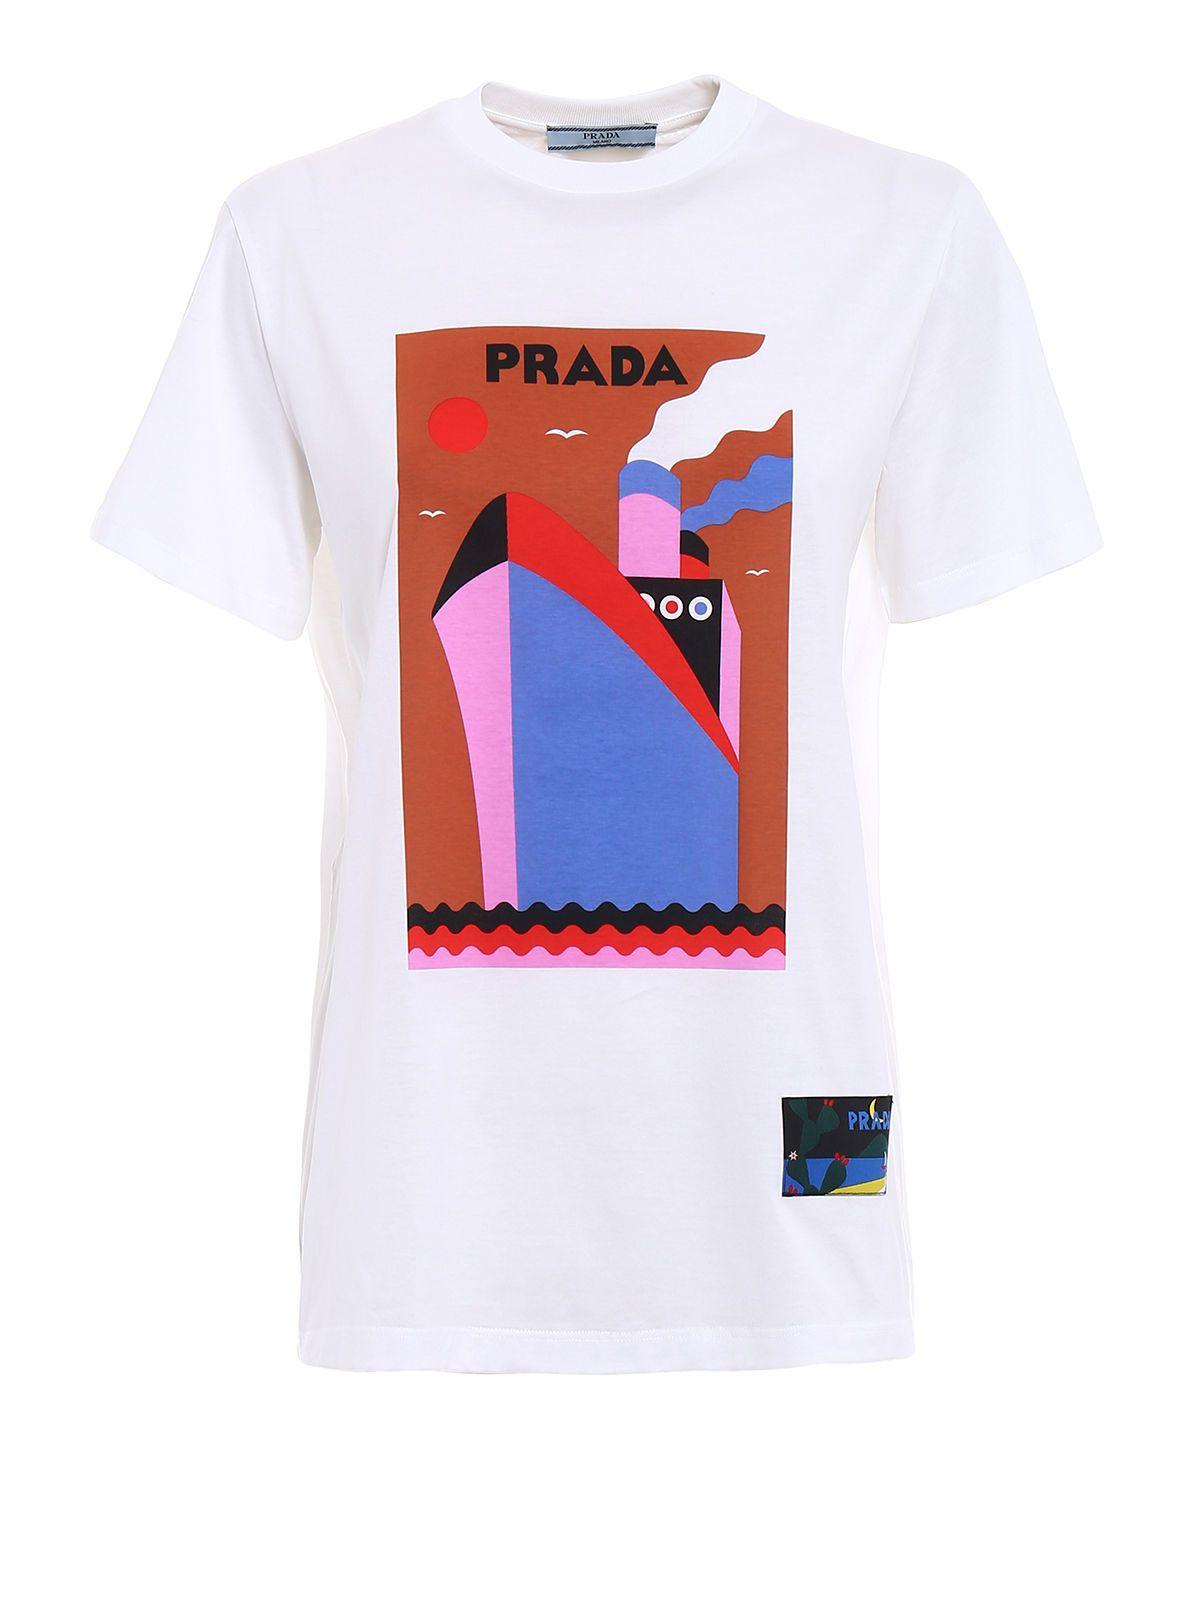 Prada Jwp Boat S-s T-shirt 10533678